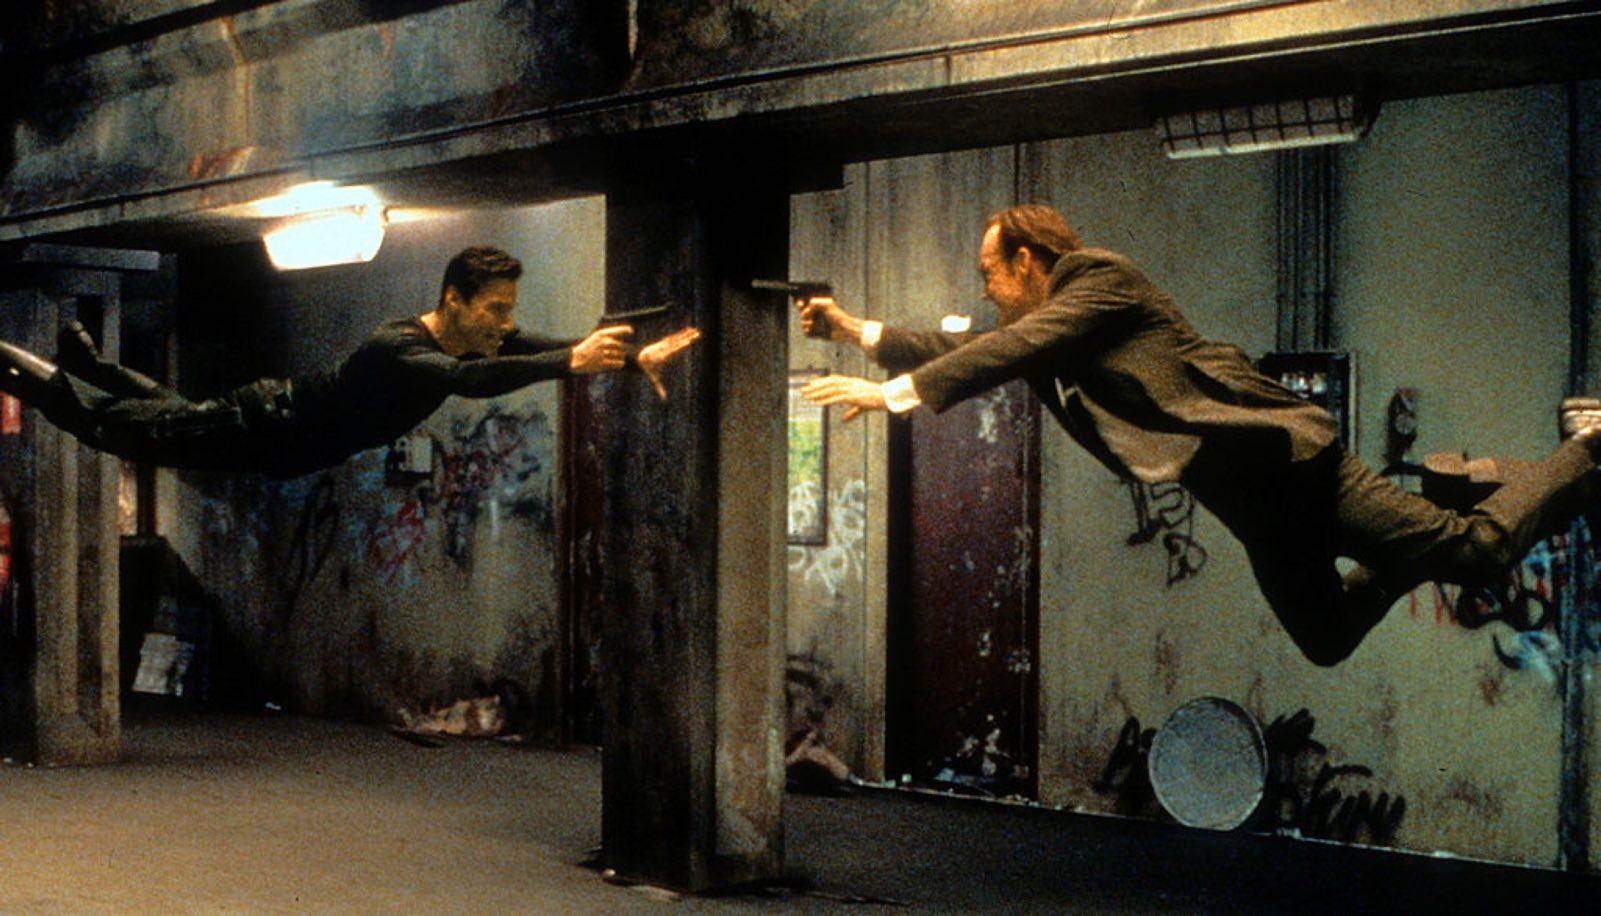 Warner Bros. Developing 'The Matrix' Reboot, Likely Without Keanu Reeves